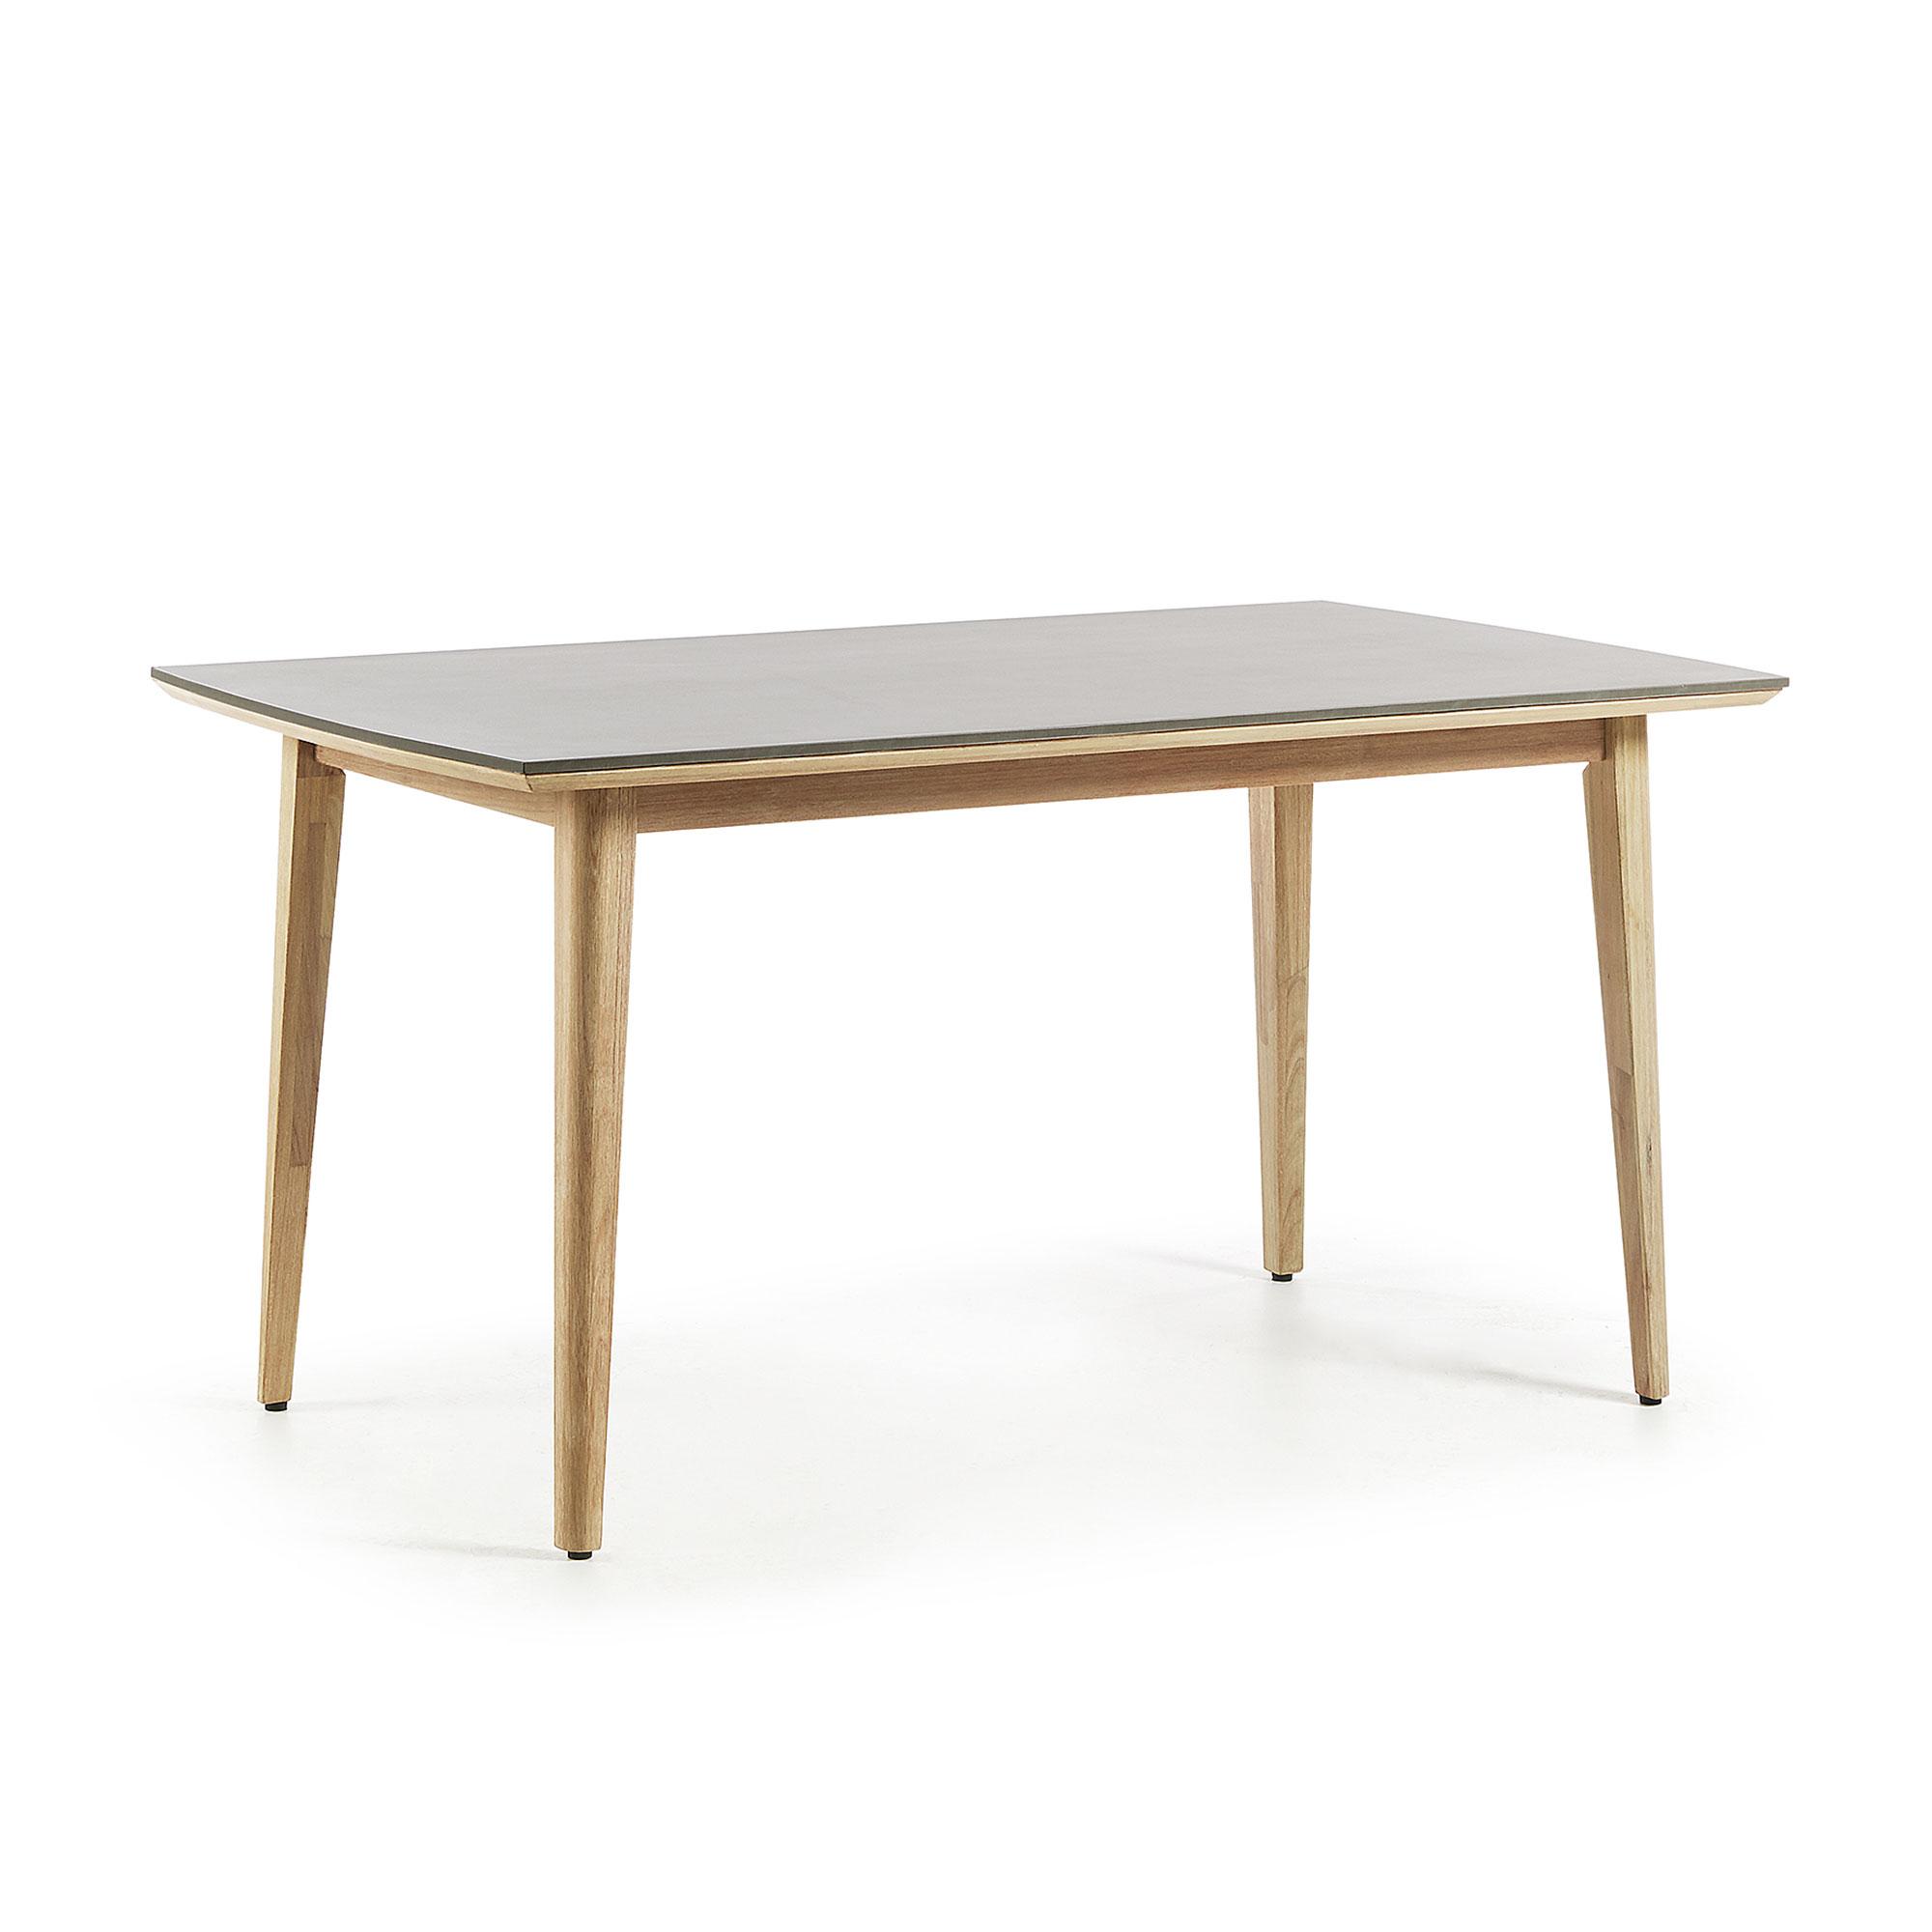 LaForma - Khloe Spisebord 160x90 - Natur/grå LaForma